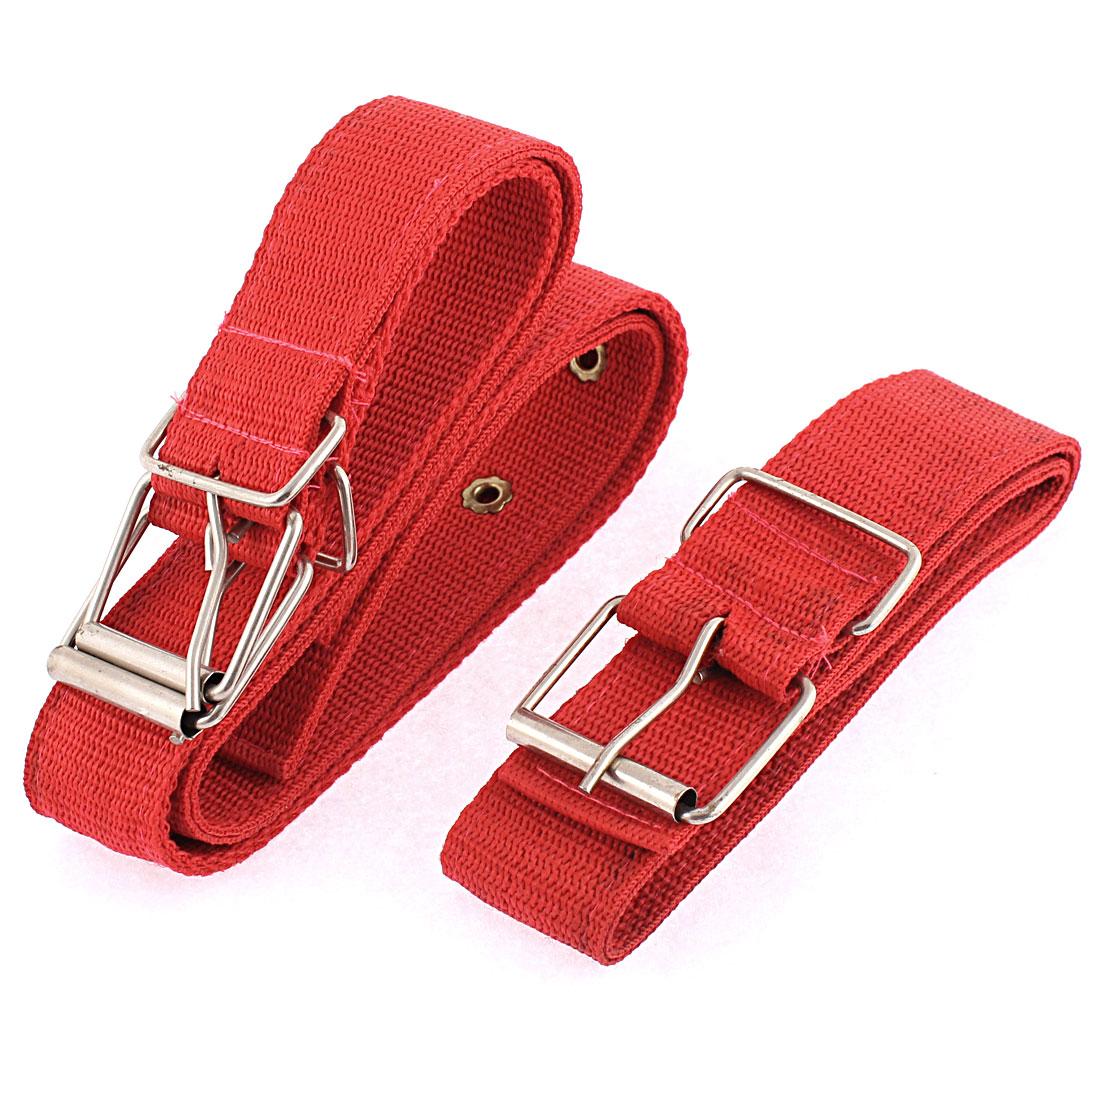 Pet Dog Dual Side Nylon Buckle Adjustable Lead Harness Belt Collar 3.6cm Width